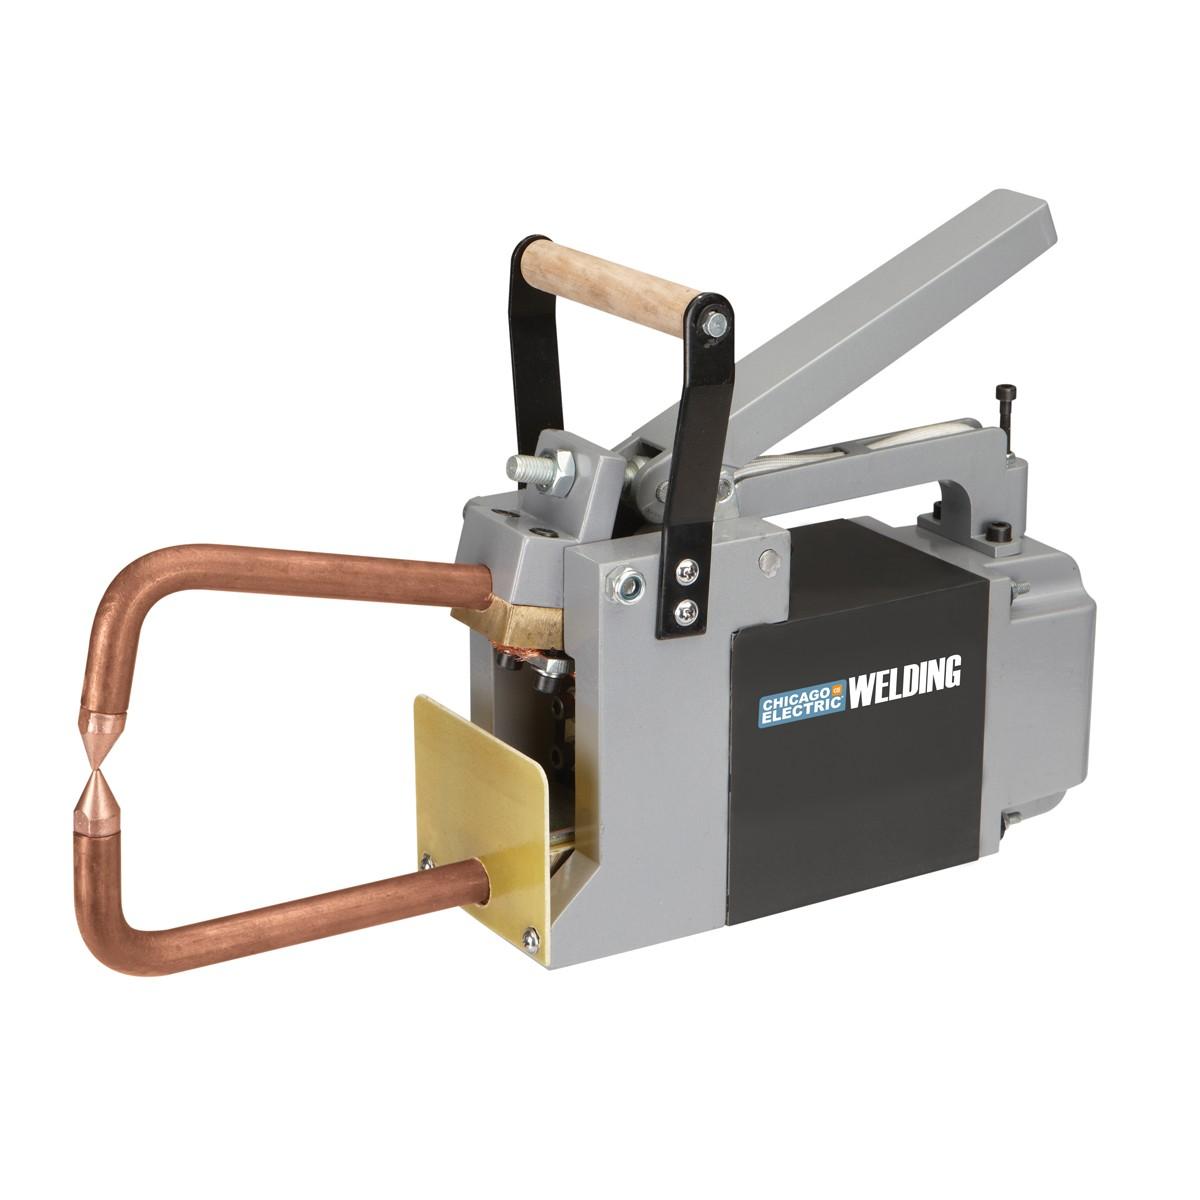 Spot Welding Applications Machine Diagram Common Welders For The Garage Of Shop